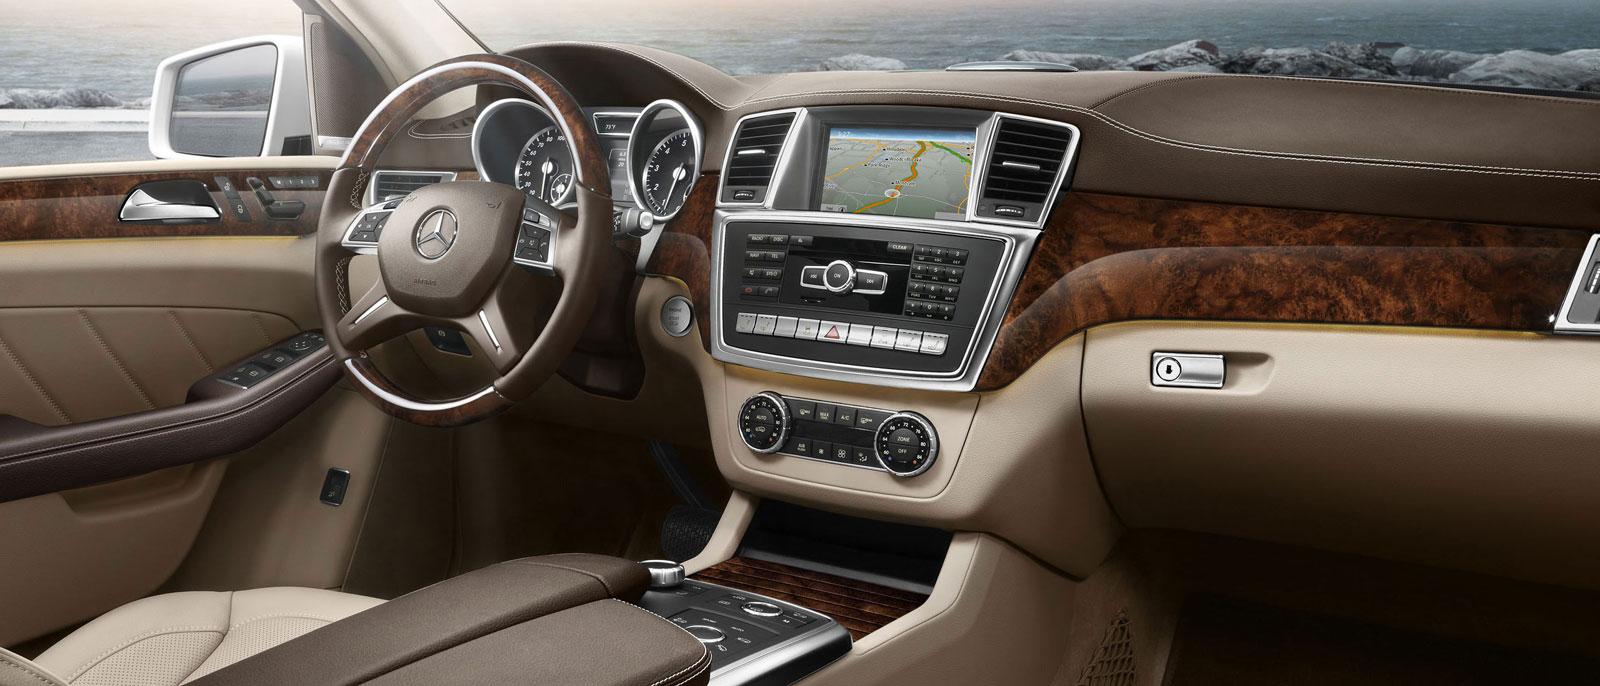 2015 Mercedes-Benz GL SUV